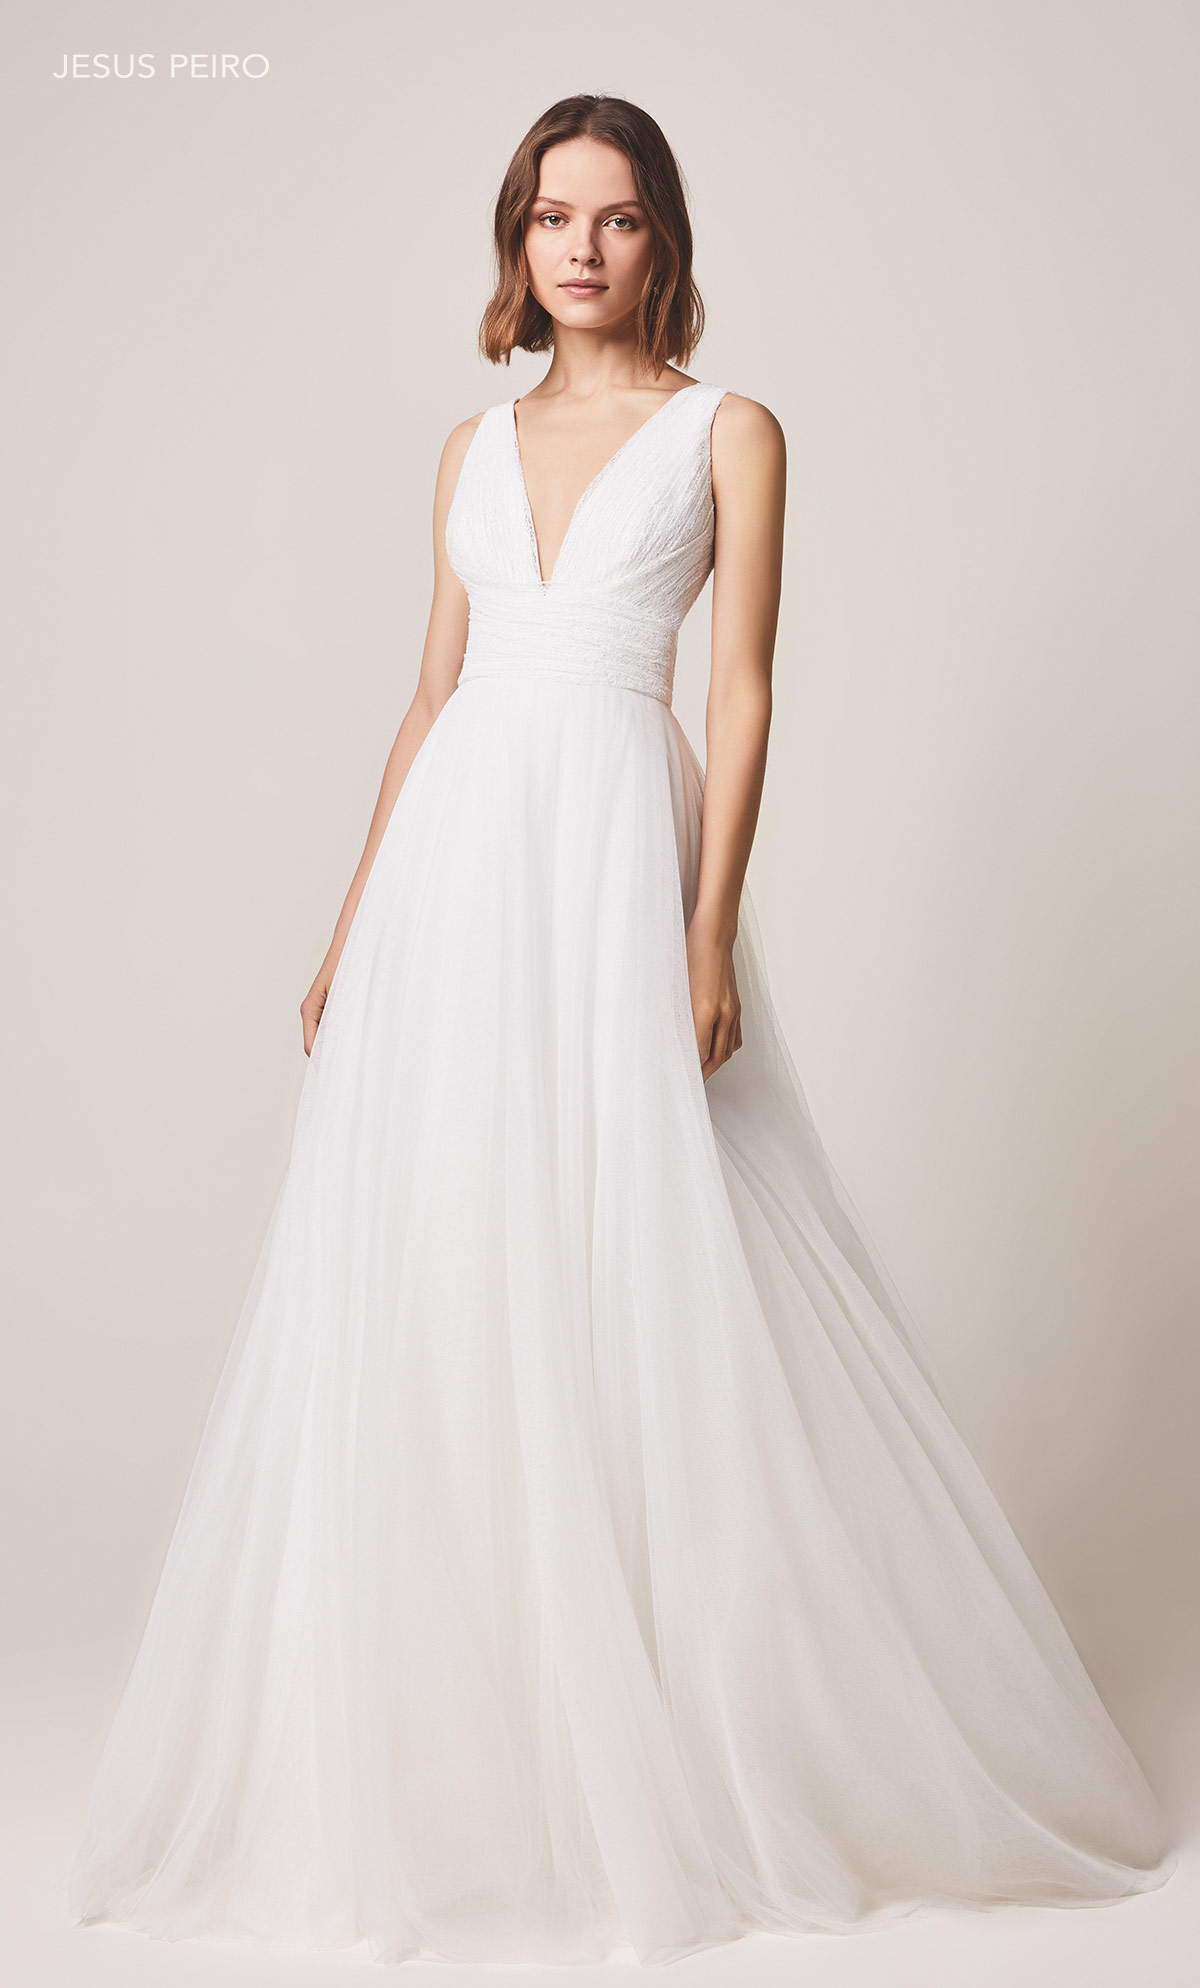 Vestido novia Jesús Peiró Ref.137